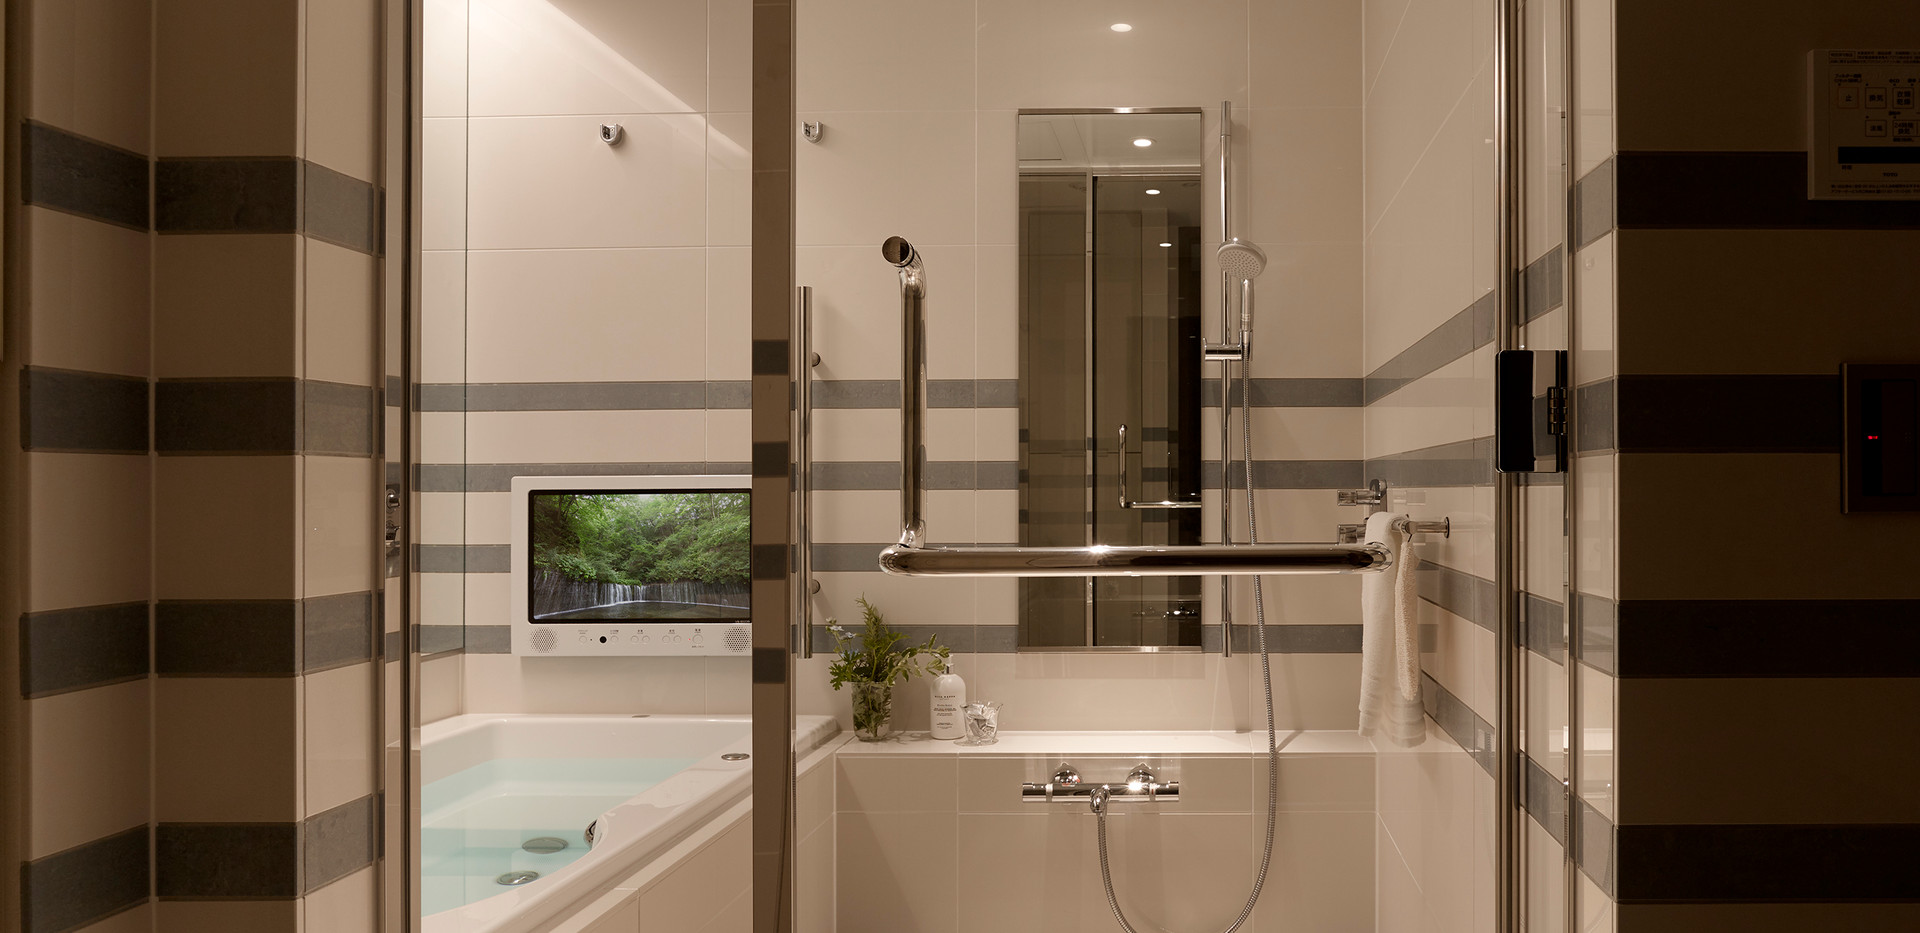 System-bath_Verde_glassdoor.jpg